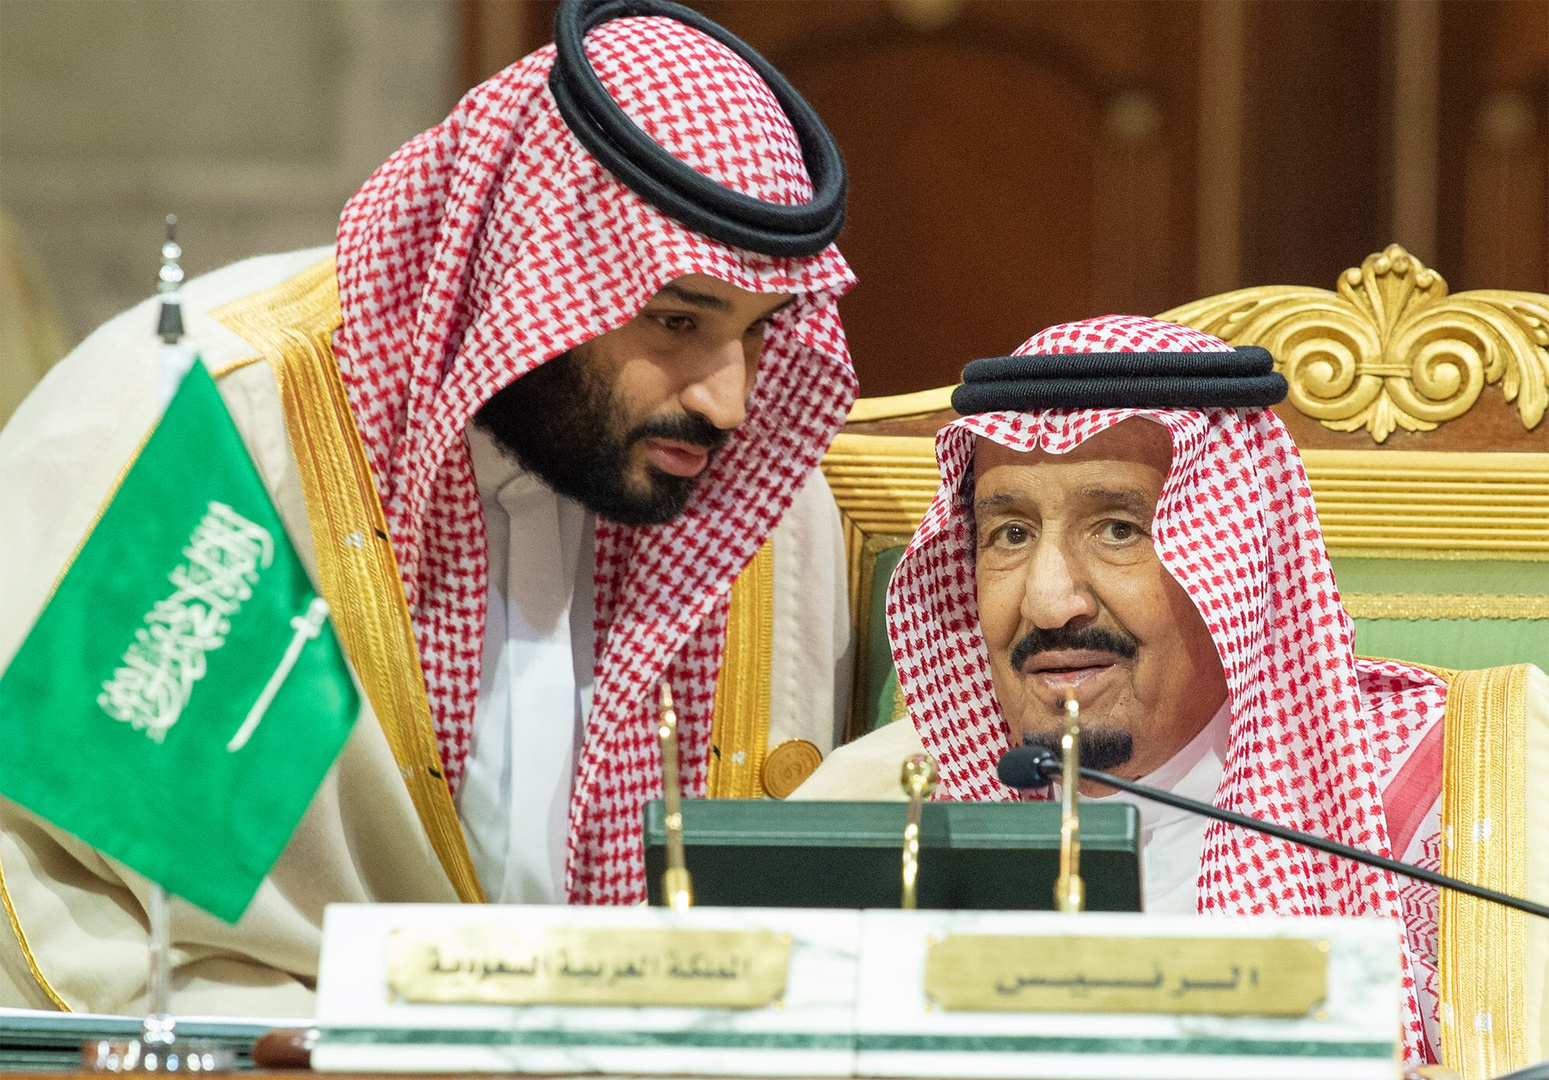 العاهل السعودي وولي عهده يهنئان بايدن